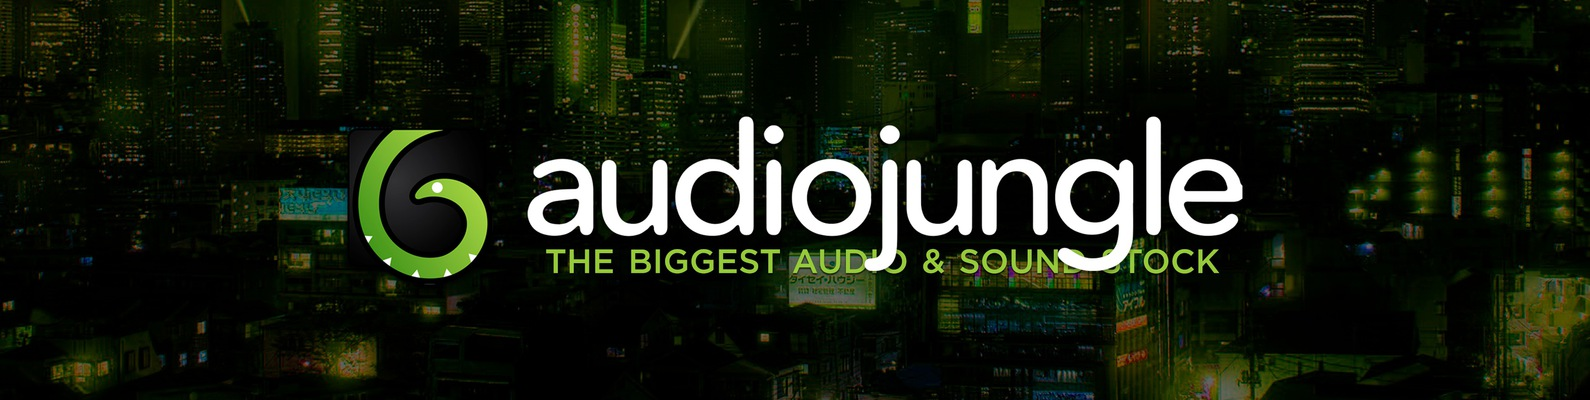 Torrent audiojungle